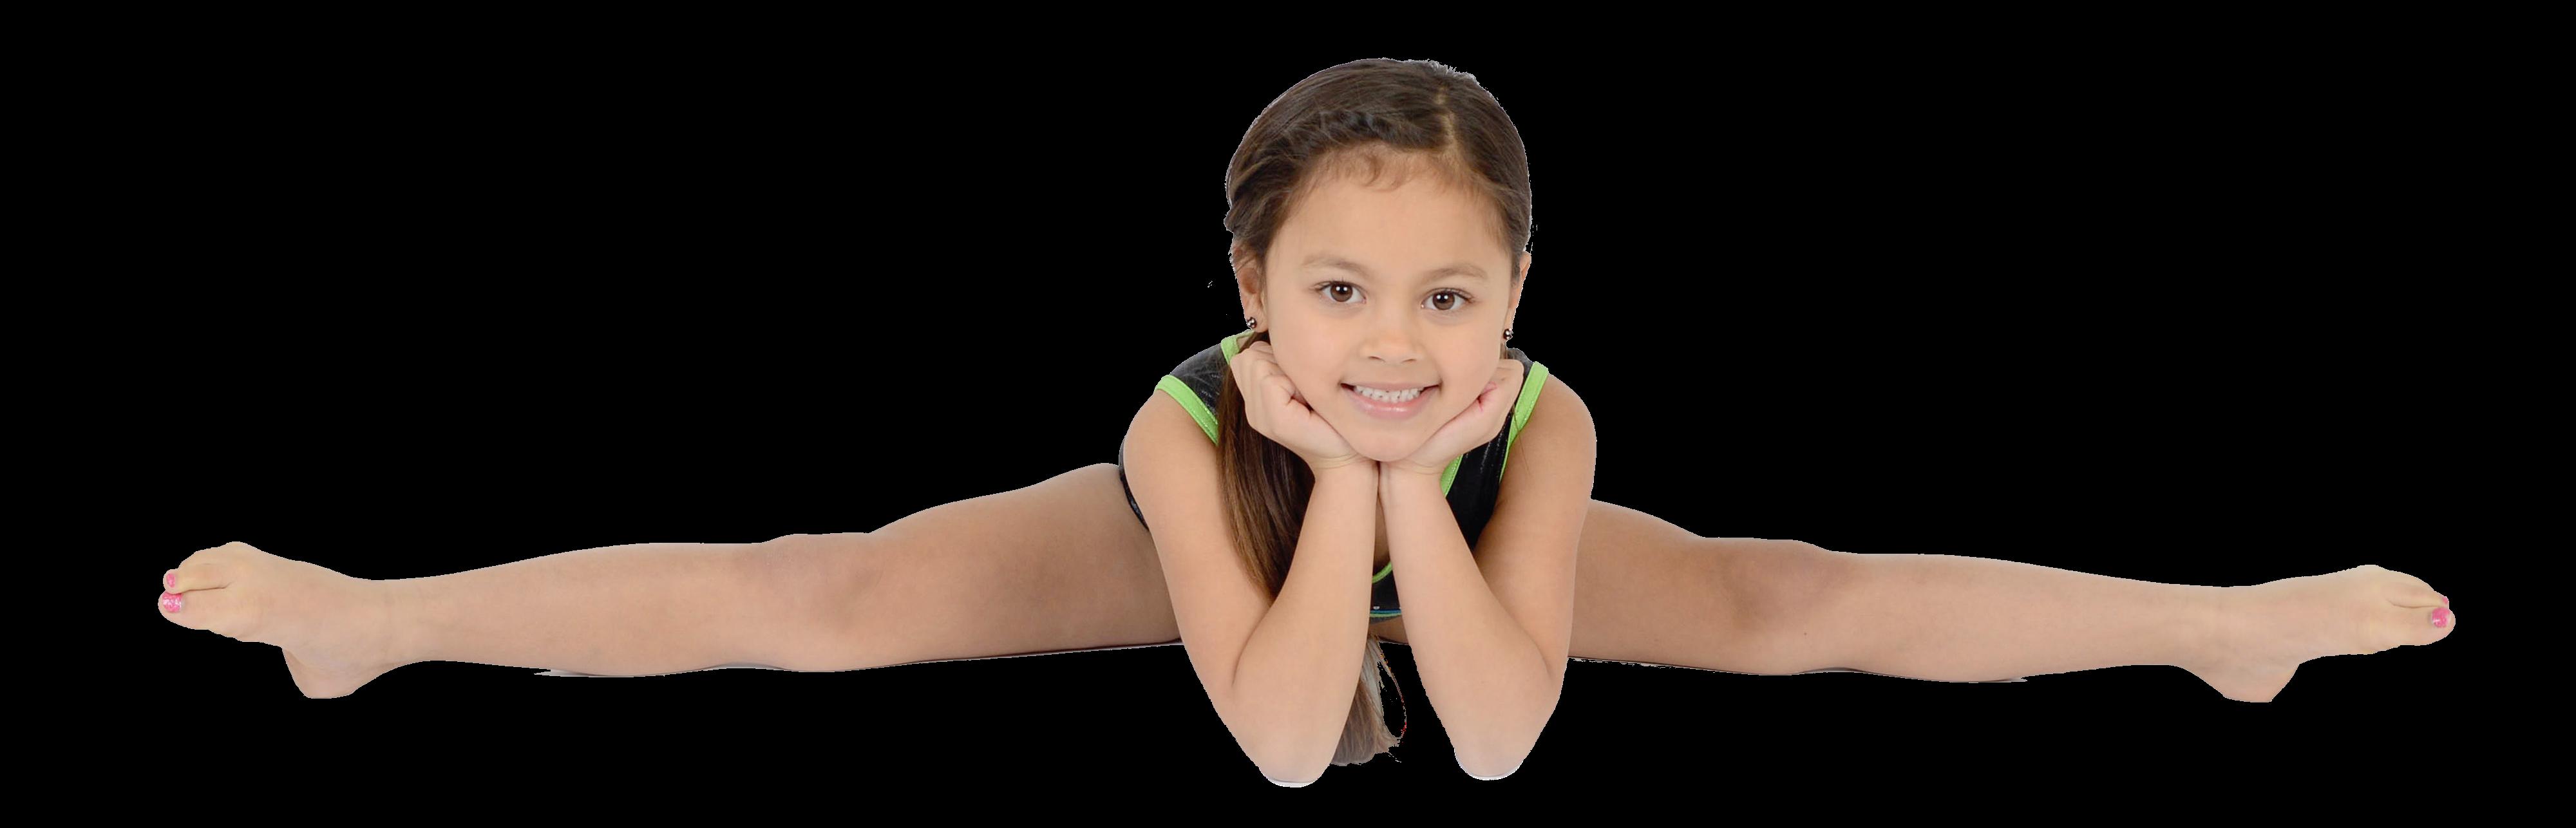 Gymnastics - Gymnastics PNG Splits